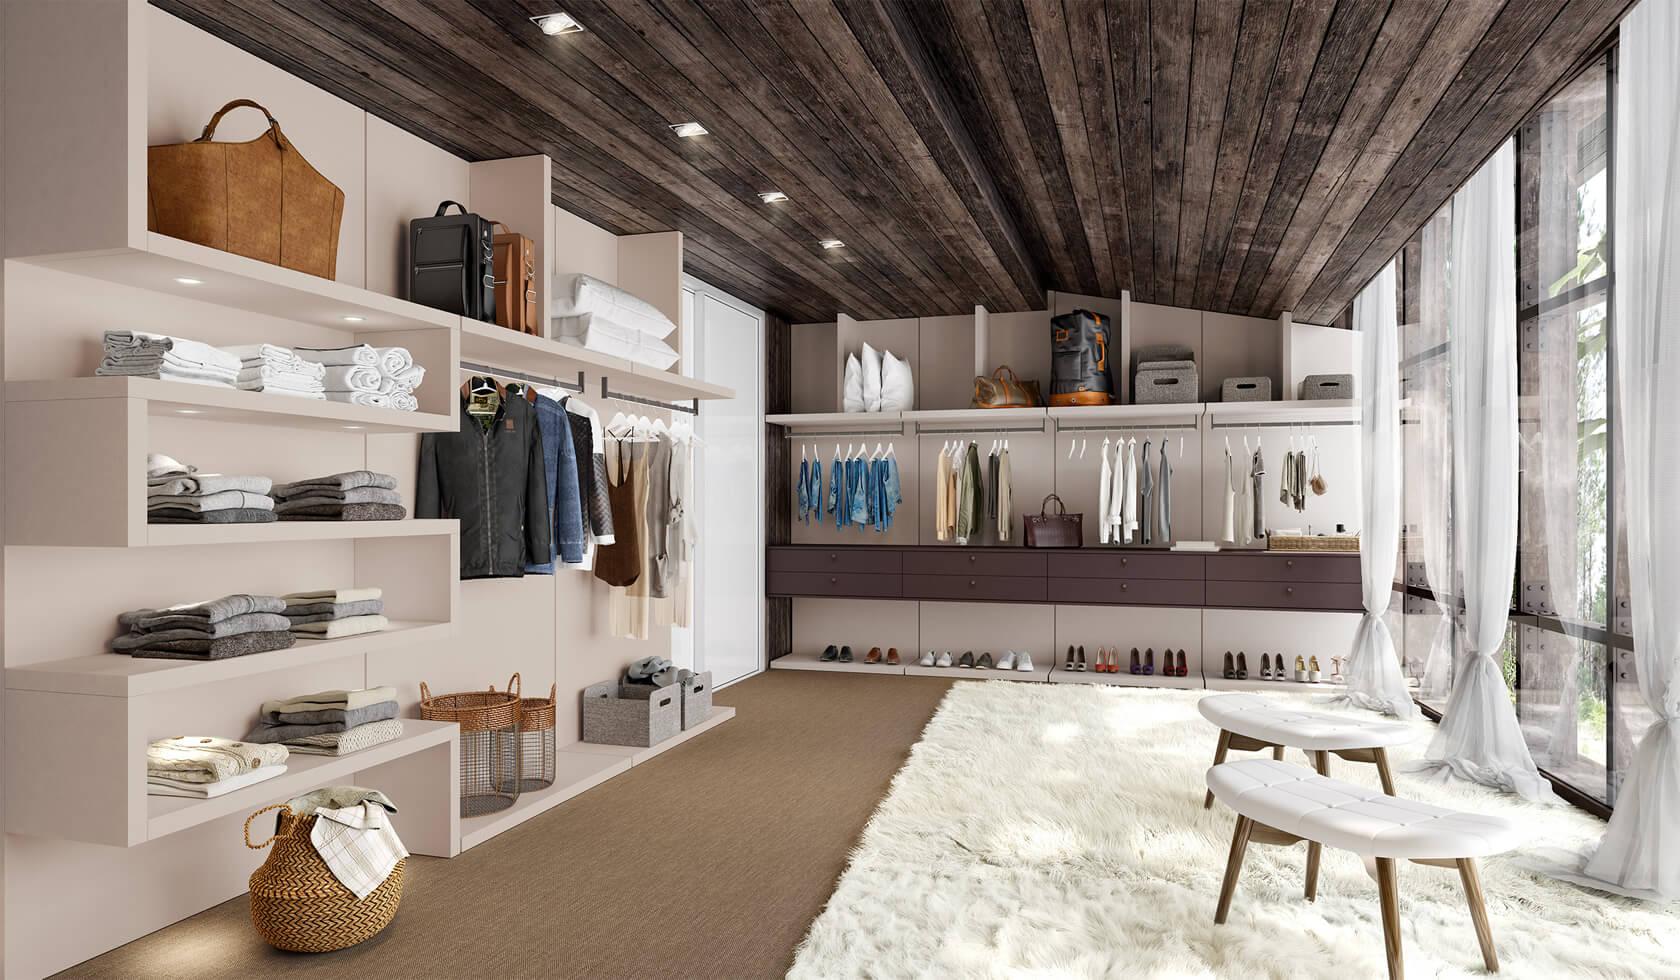 walk in closet - conceito de closet aberto personalizado